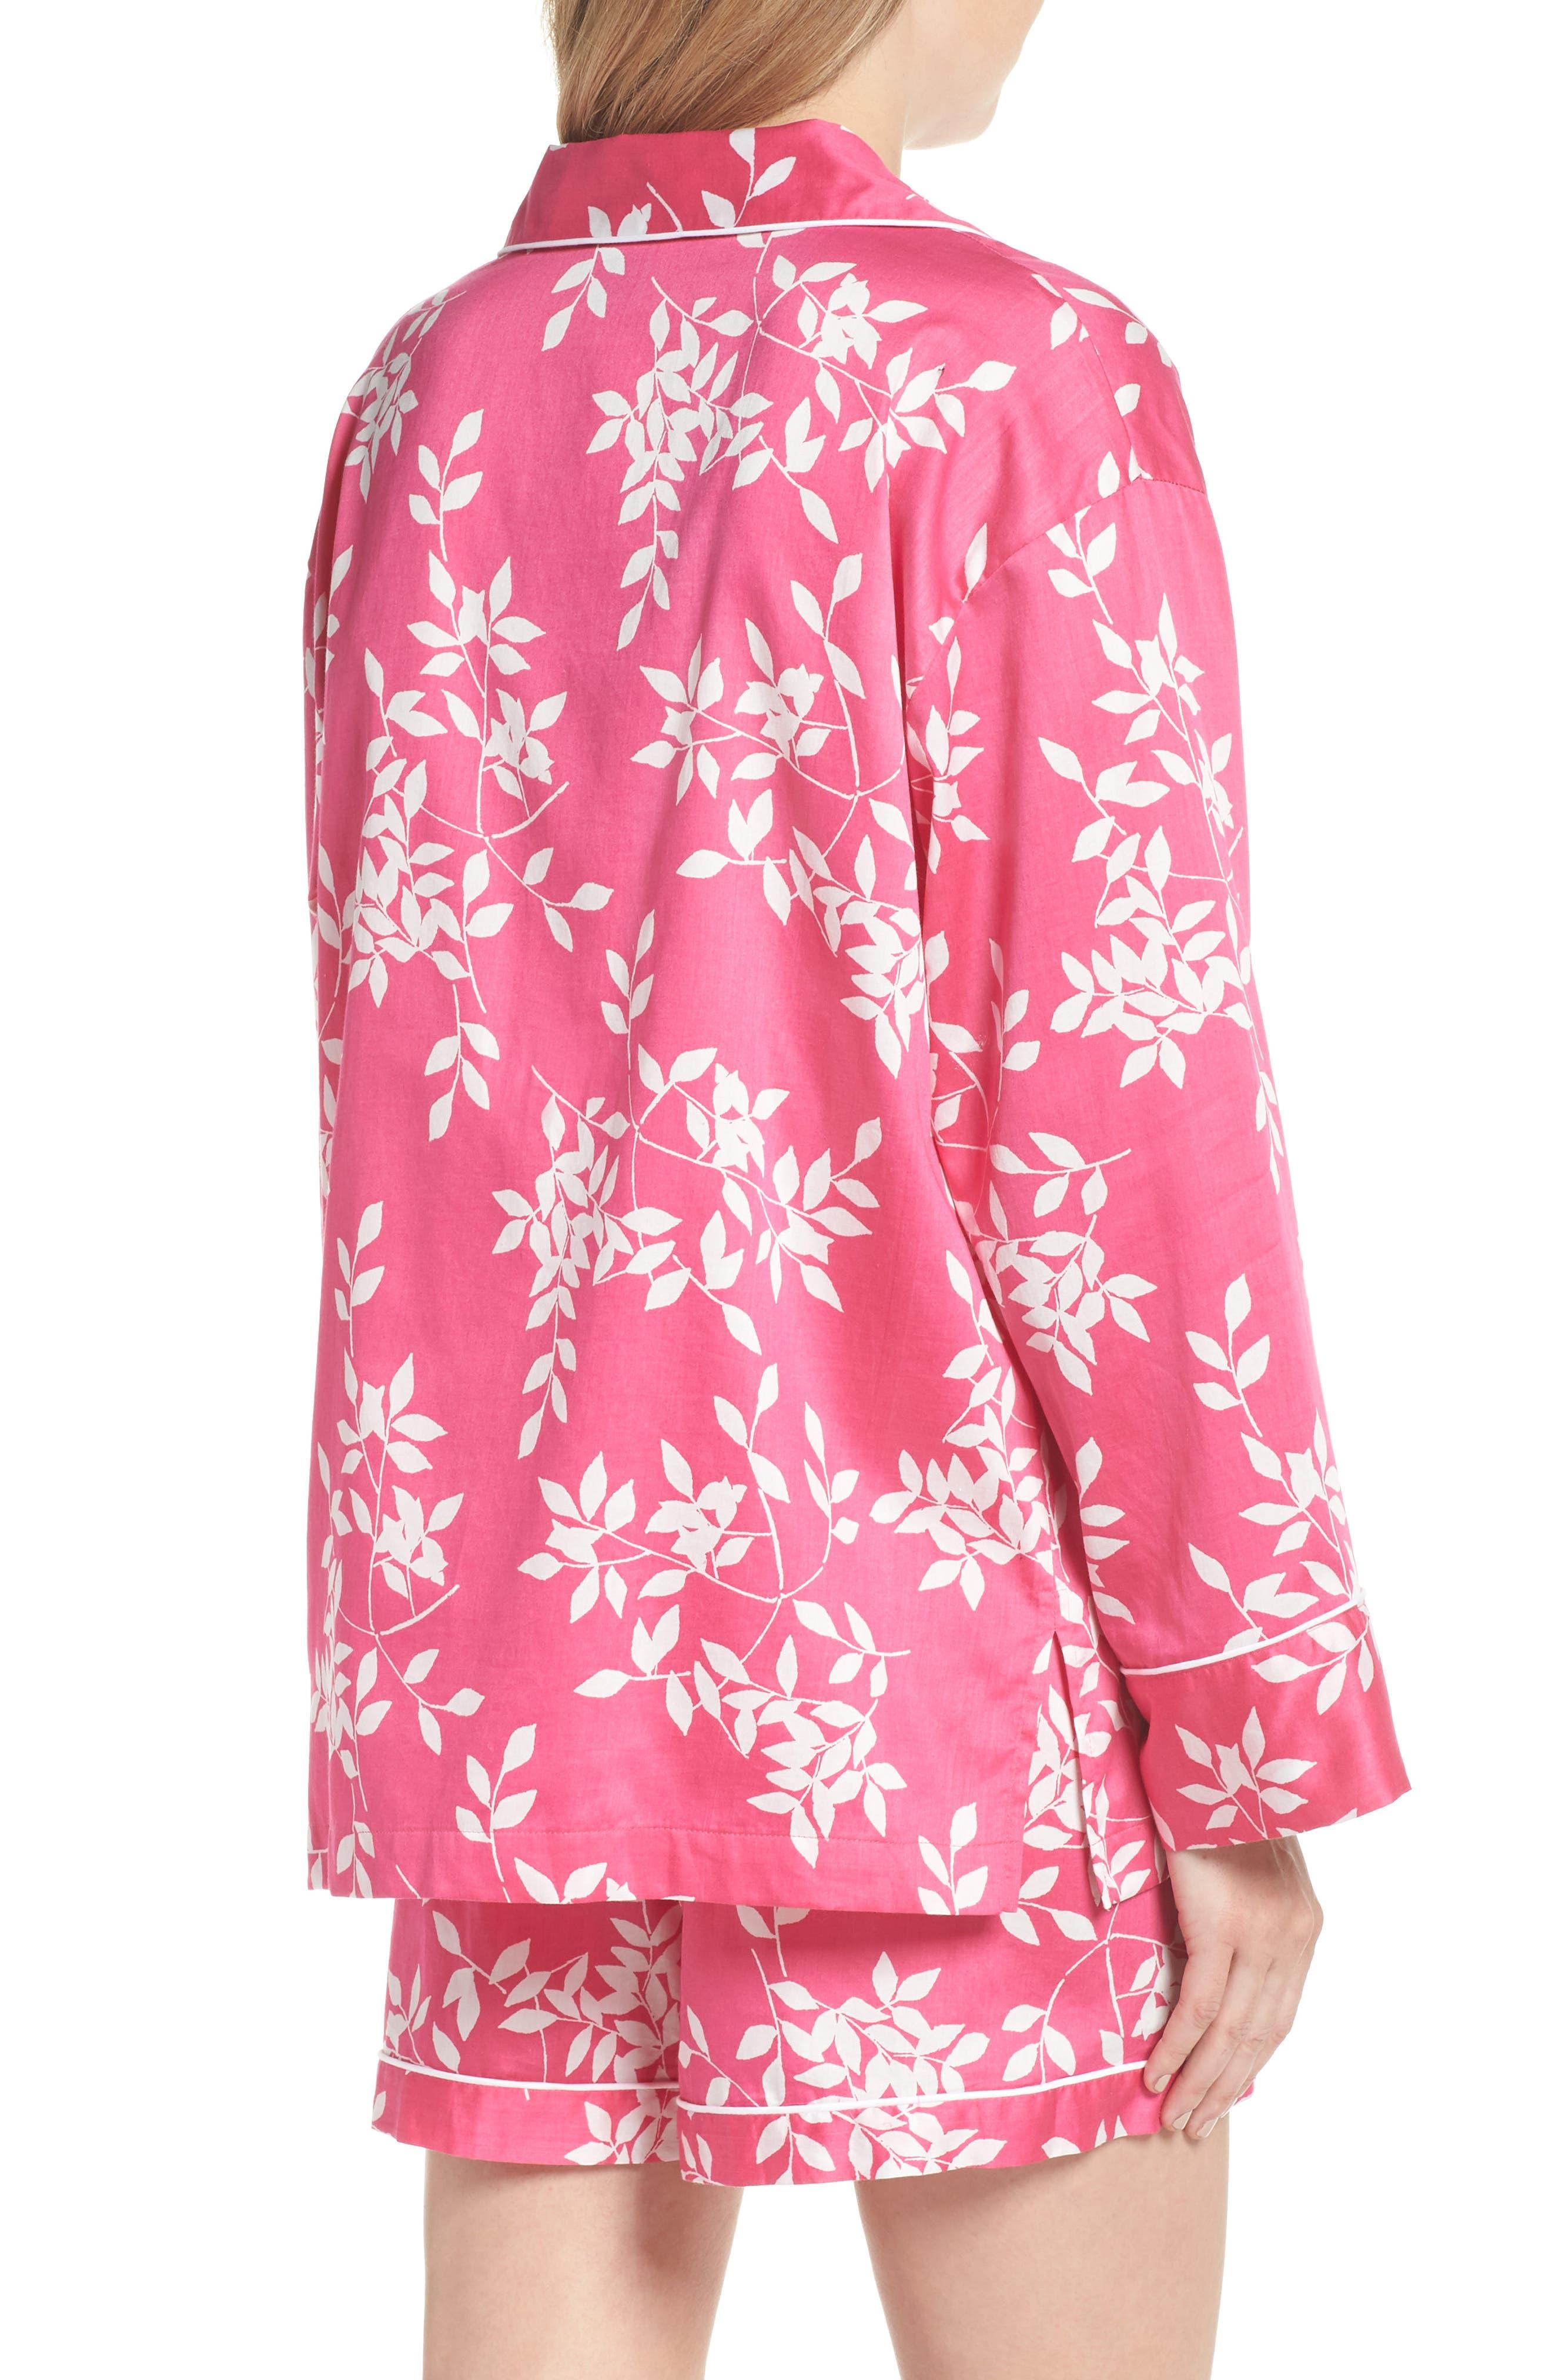 Branch Print Cotton Sateen Short Pajamas,                             Alternate thumbnail 2, color,                             Hibiscus Pink